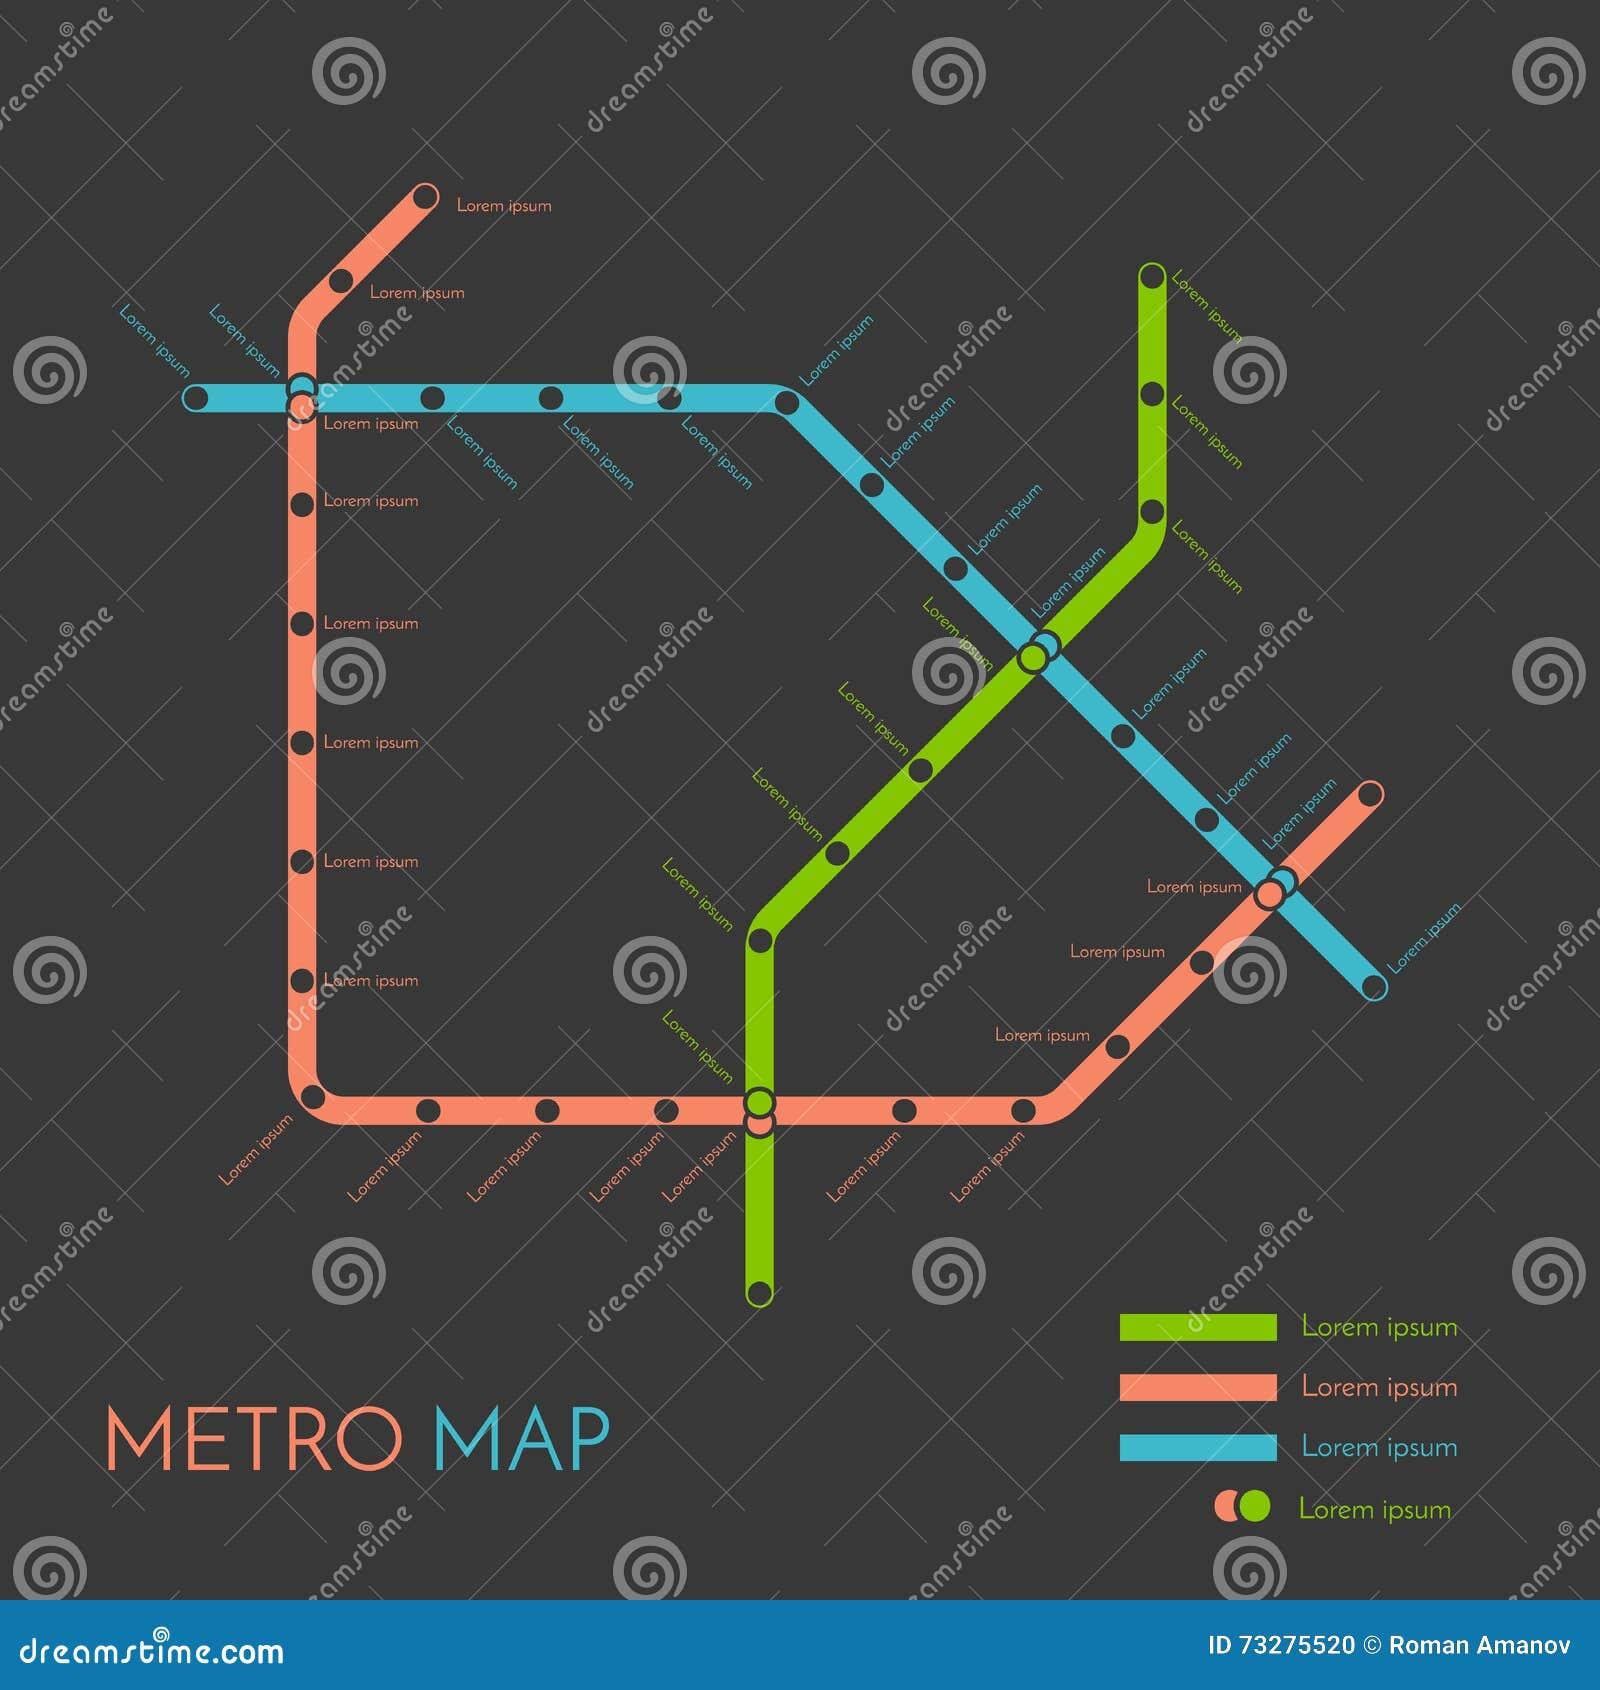 metro or subway map design template city transportation